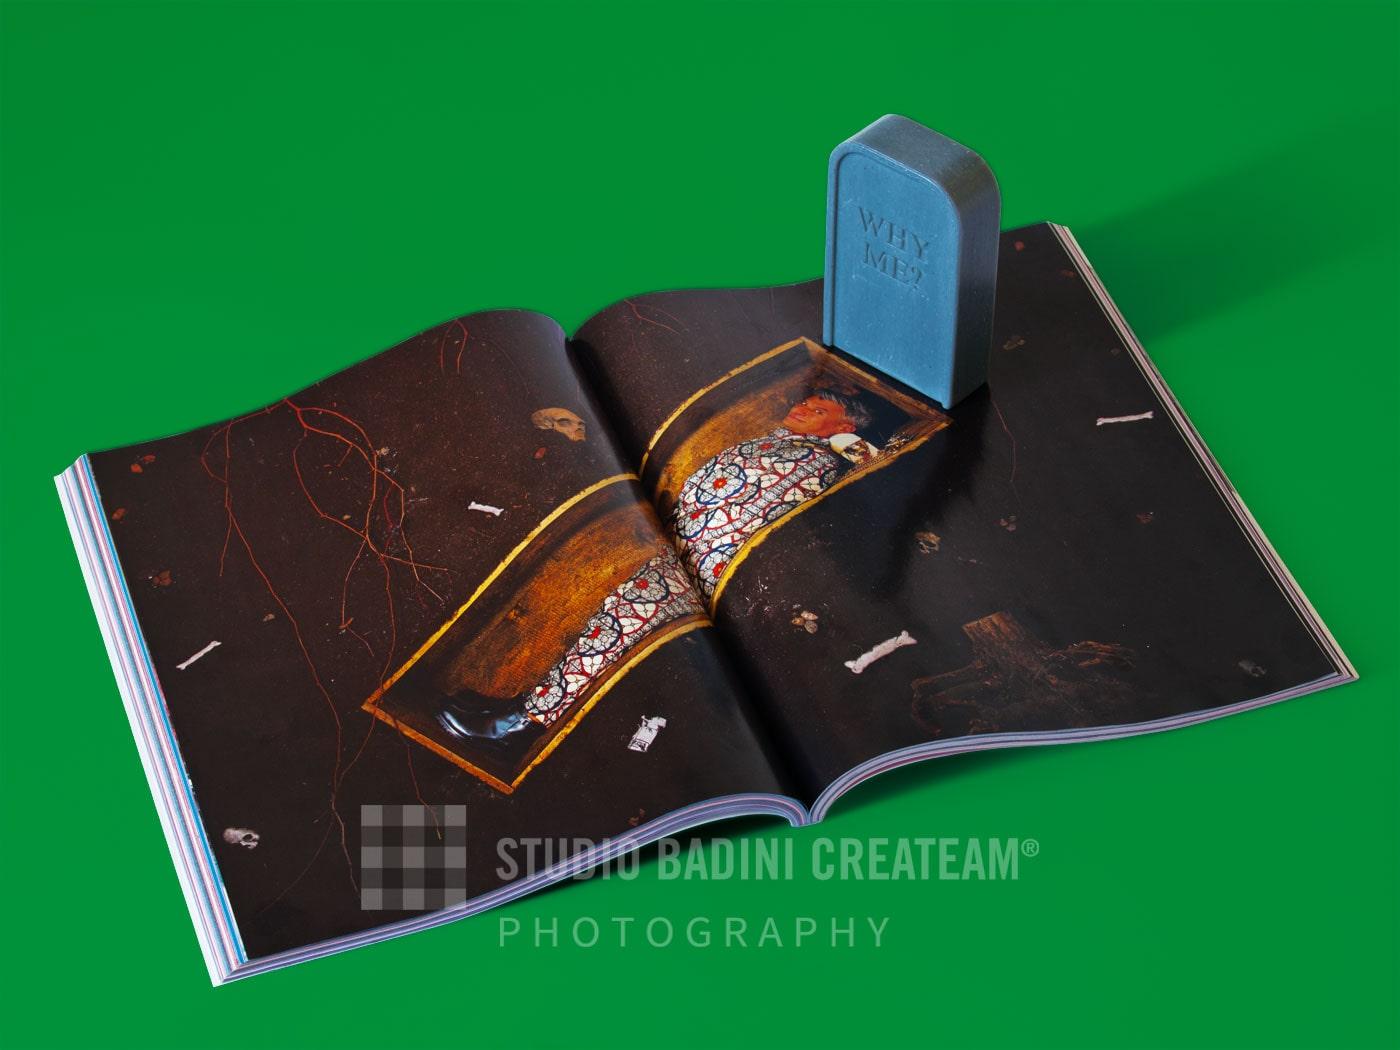 Badini Creative Studio - fotografia - toiletpaper why Me?